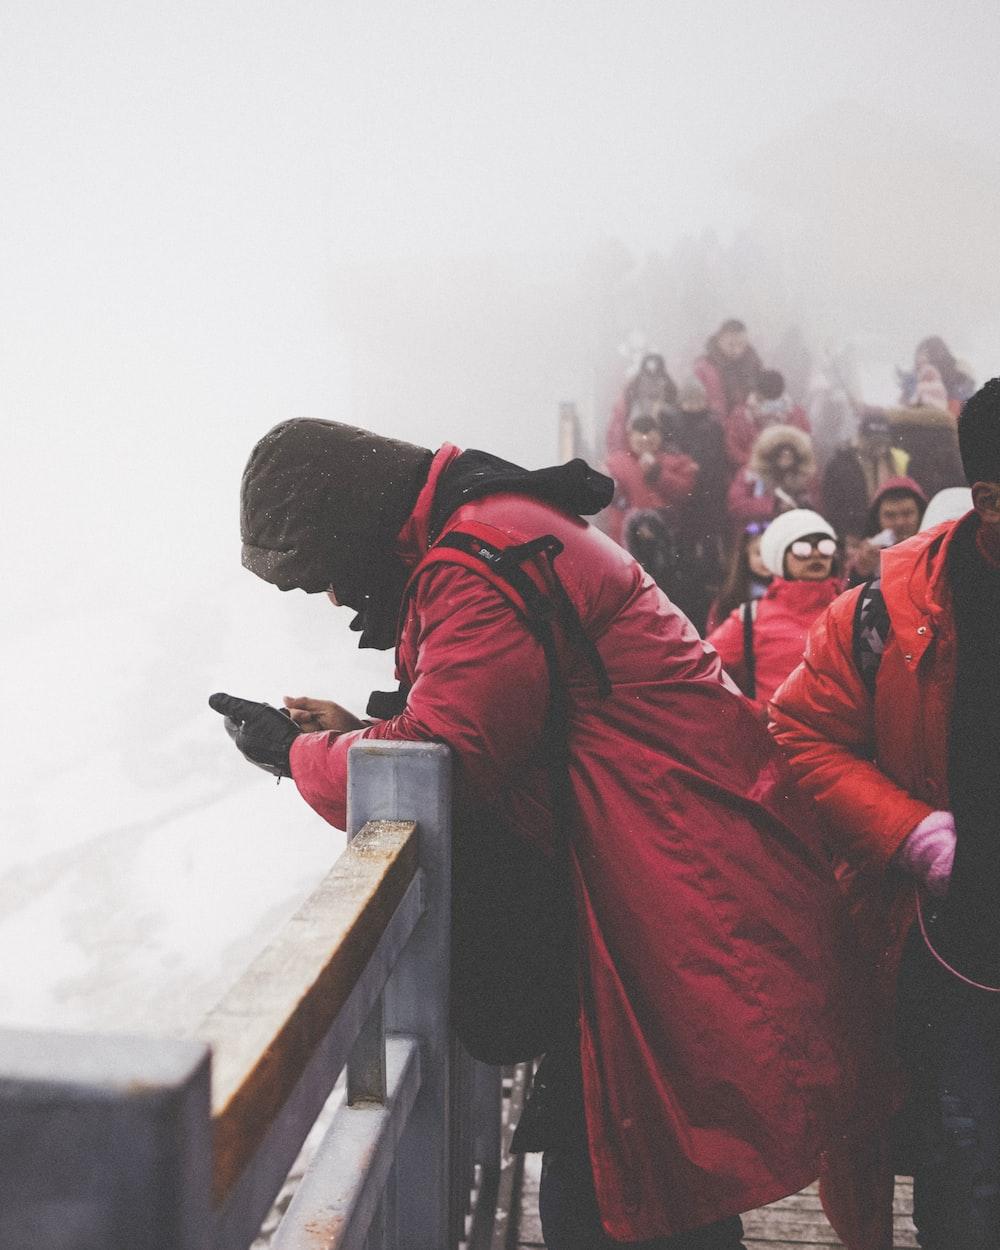 people wearing red jacket walking on bridge